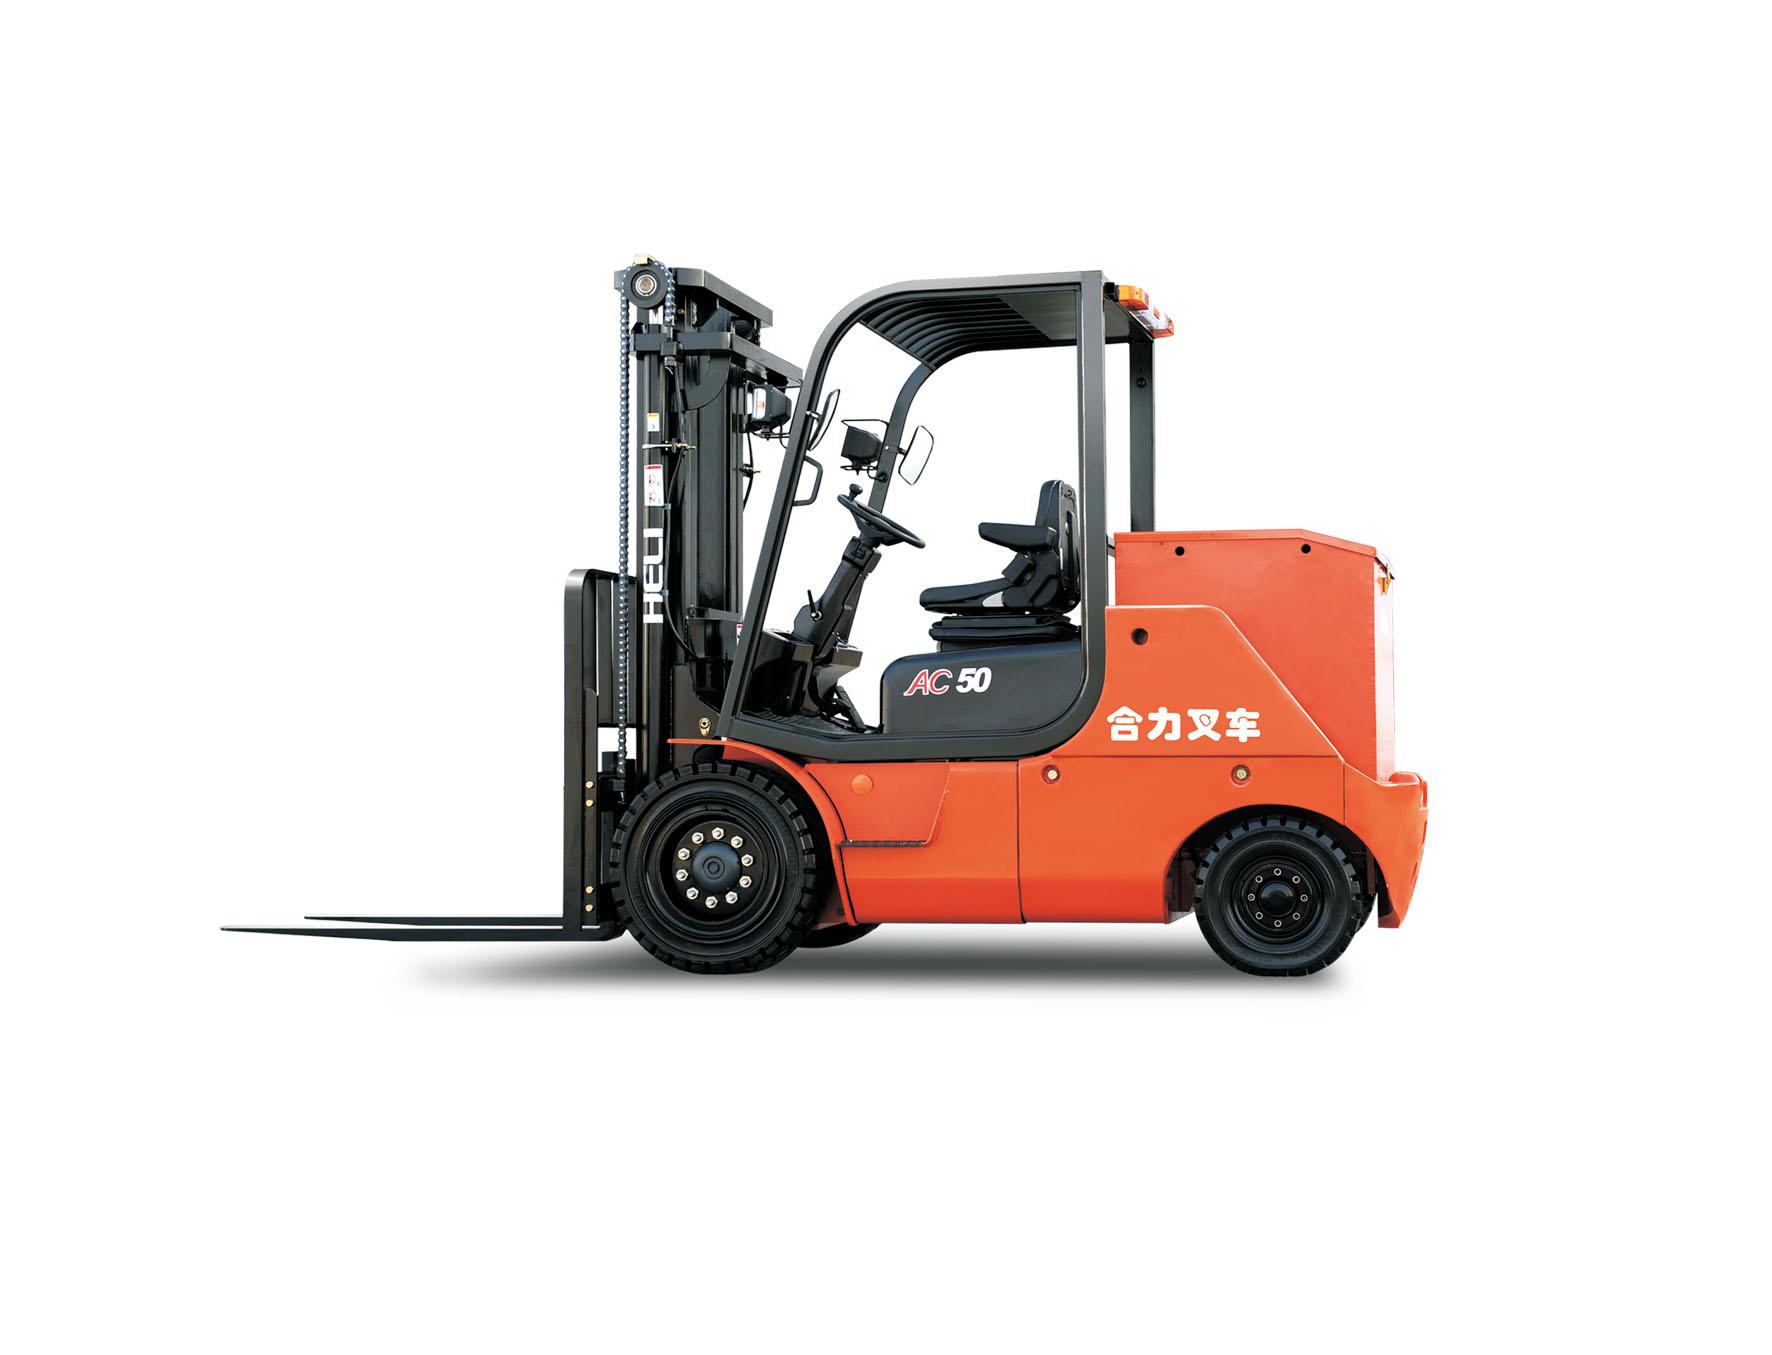 Trifik Forklifts Ltd Electric Gas Diesel Forklifts New Used Forklifts Ireland G Ac 6 7t